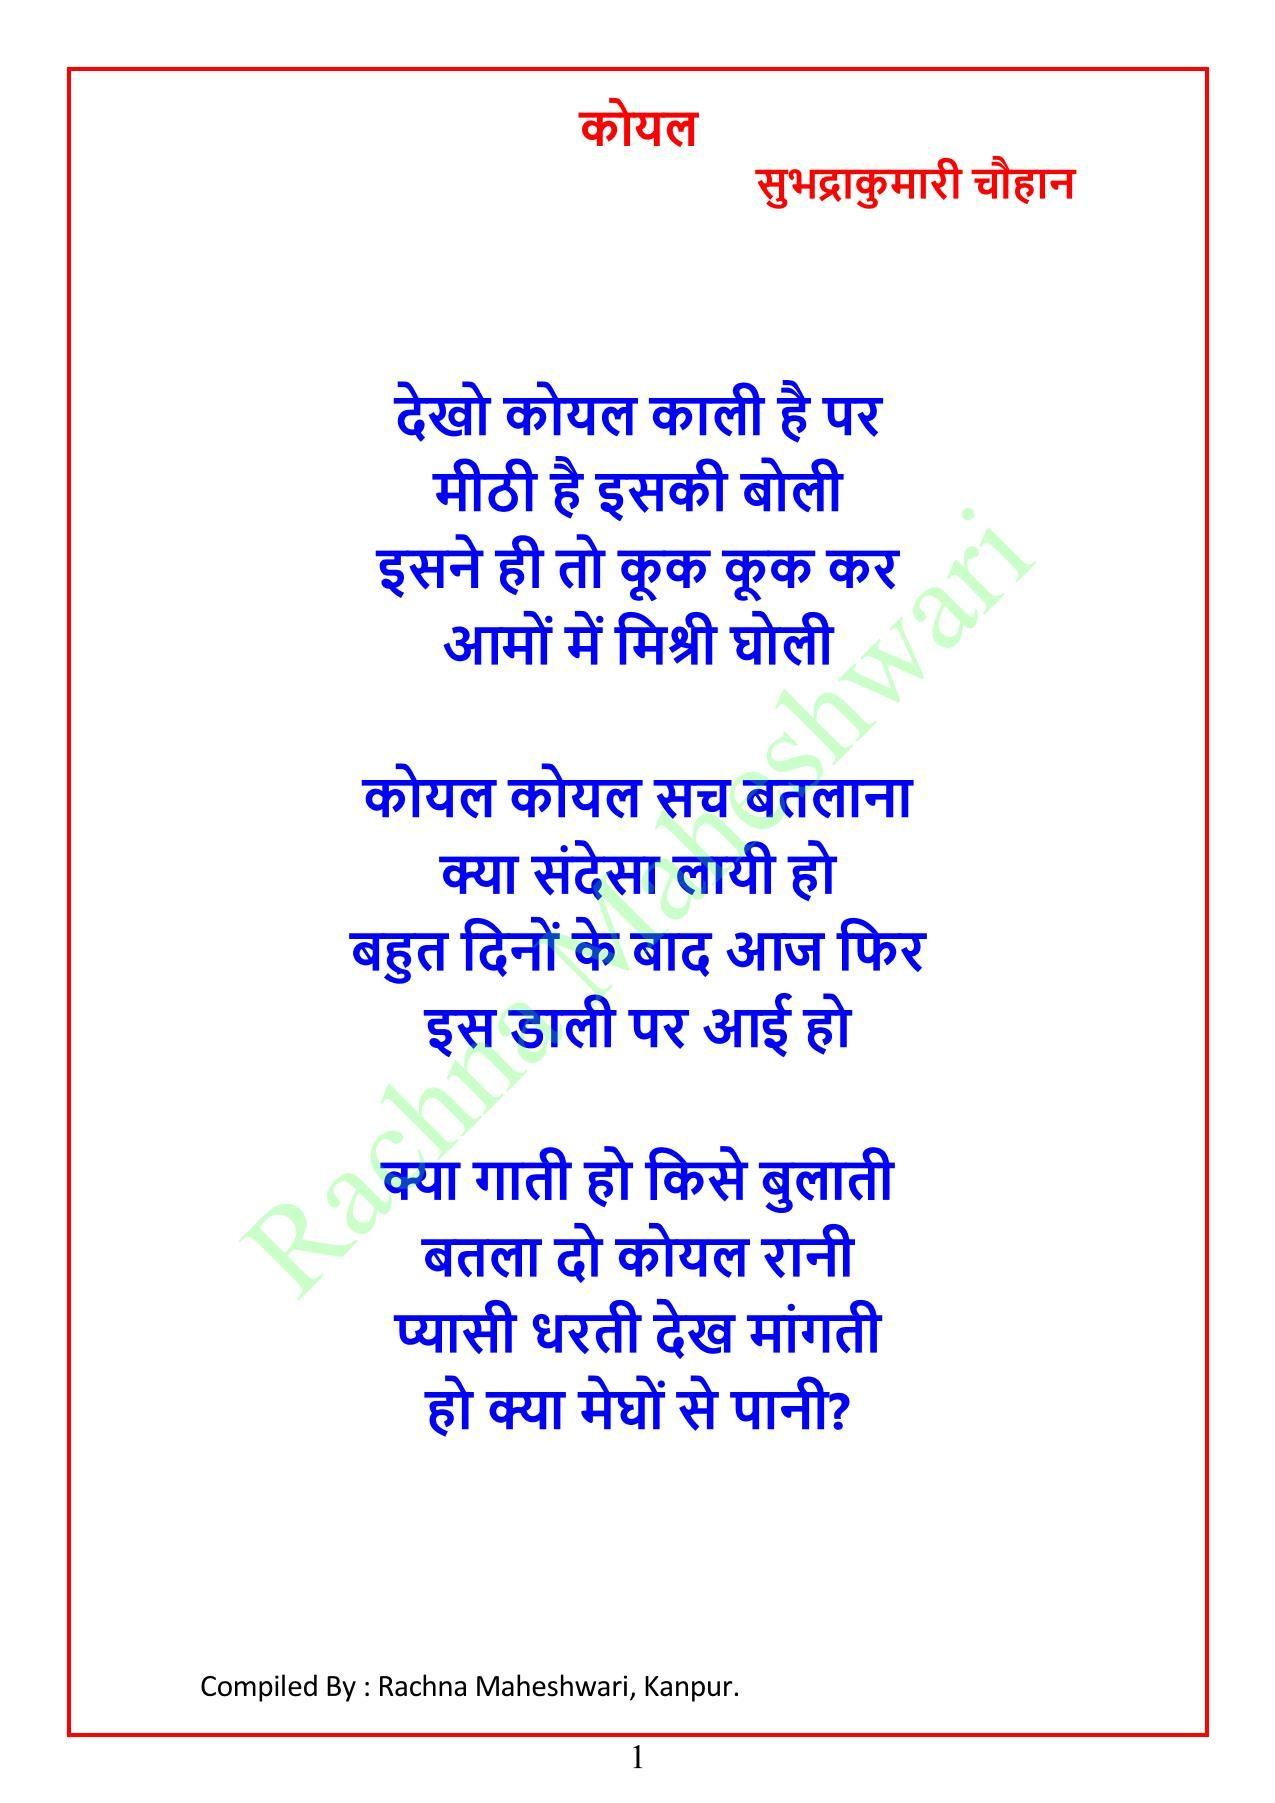 Pin by Priti Singh on Hindi for kids | Pinterest | Poem, Kids poems ...